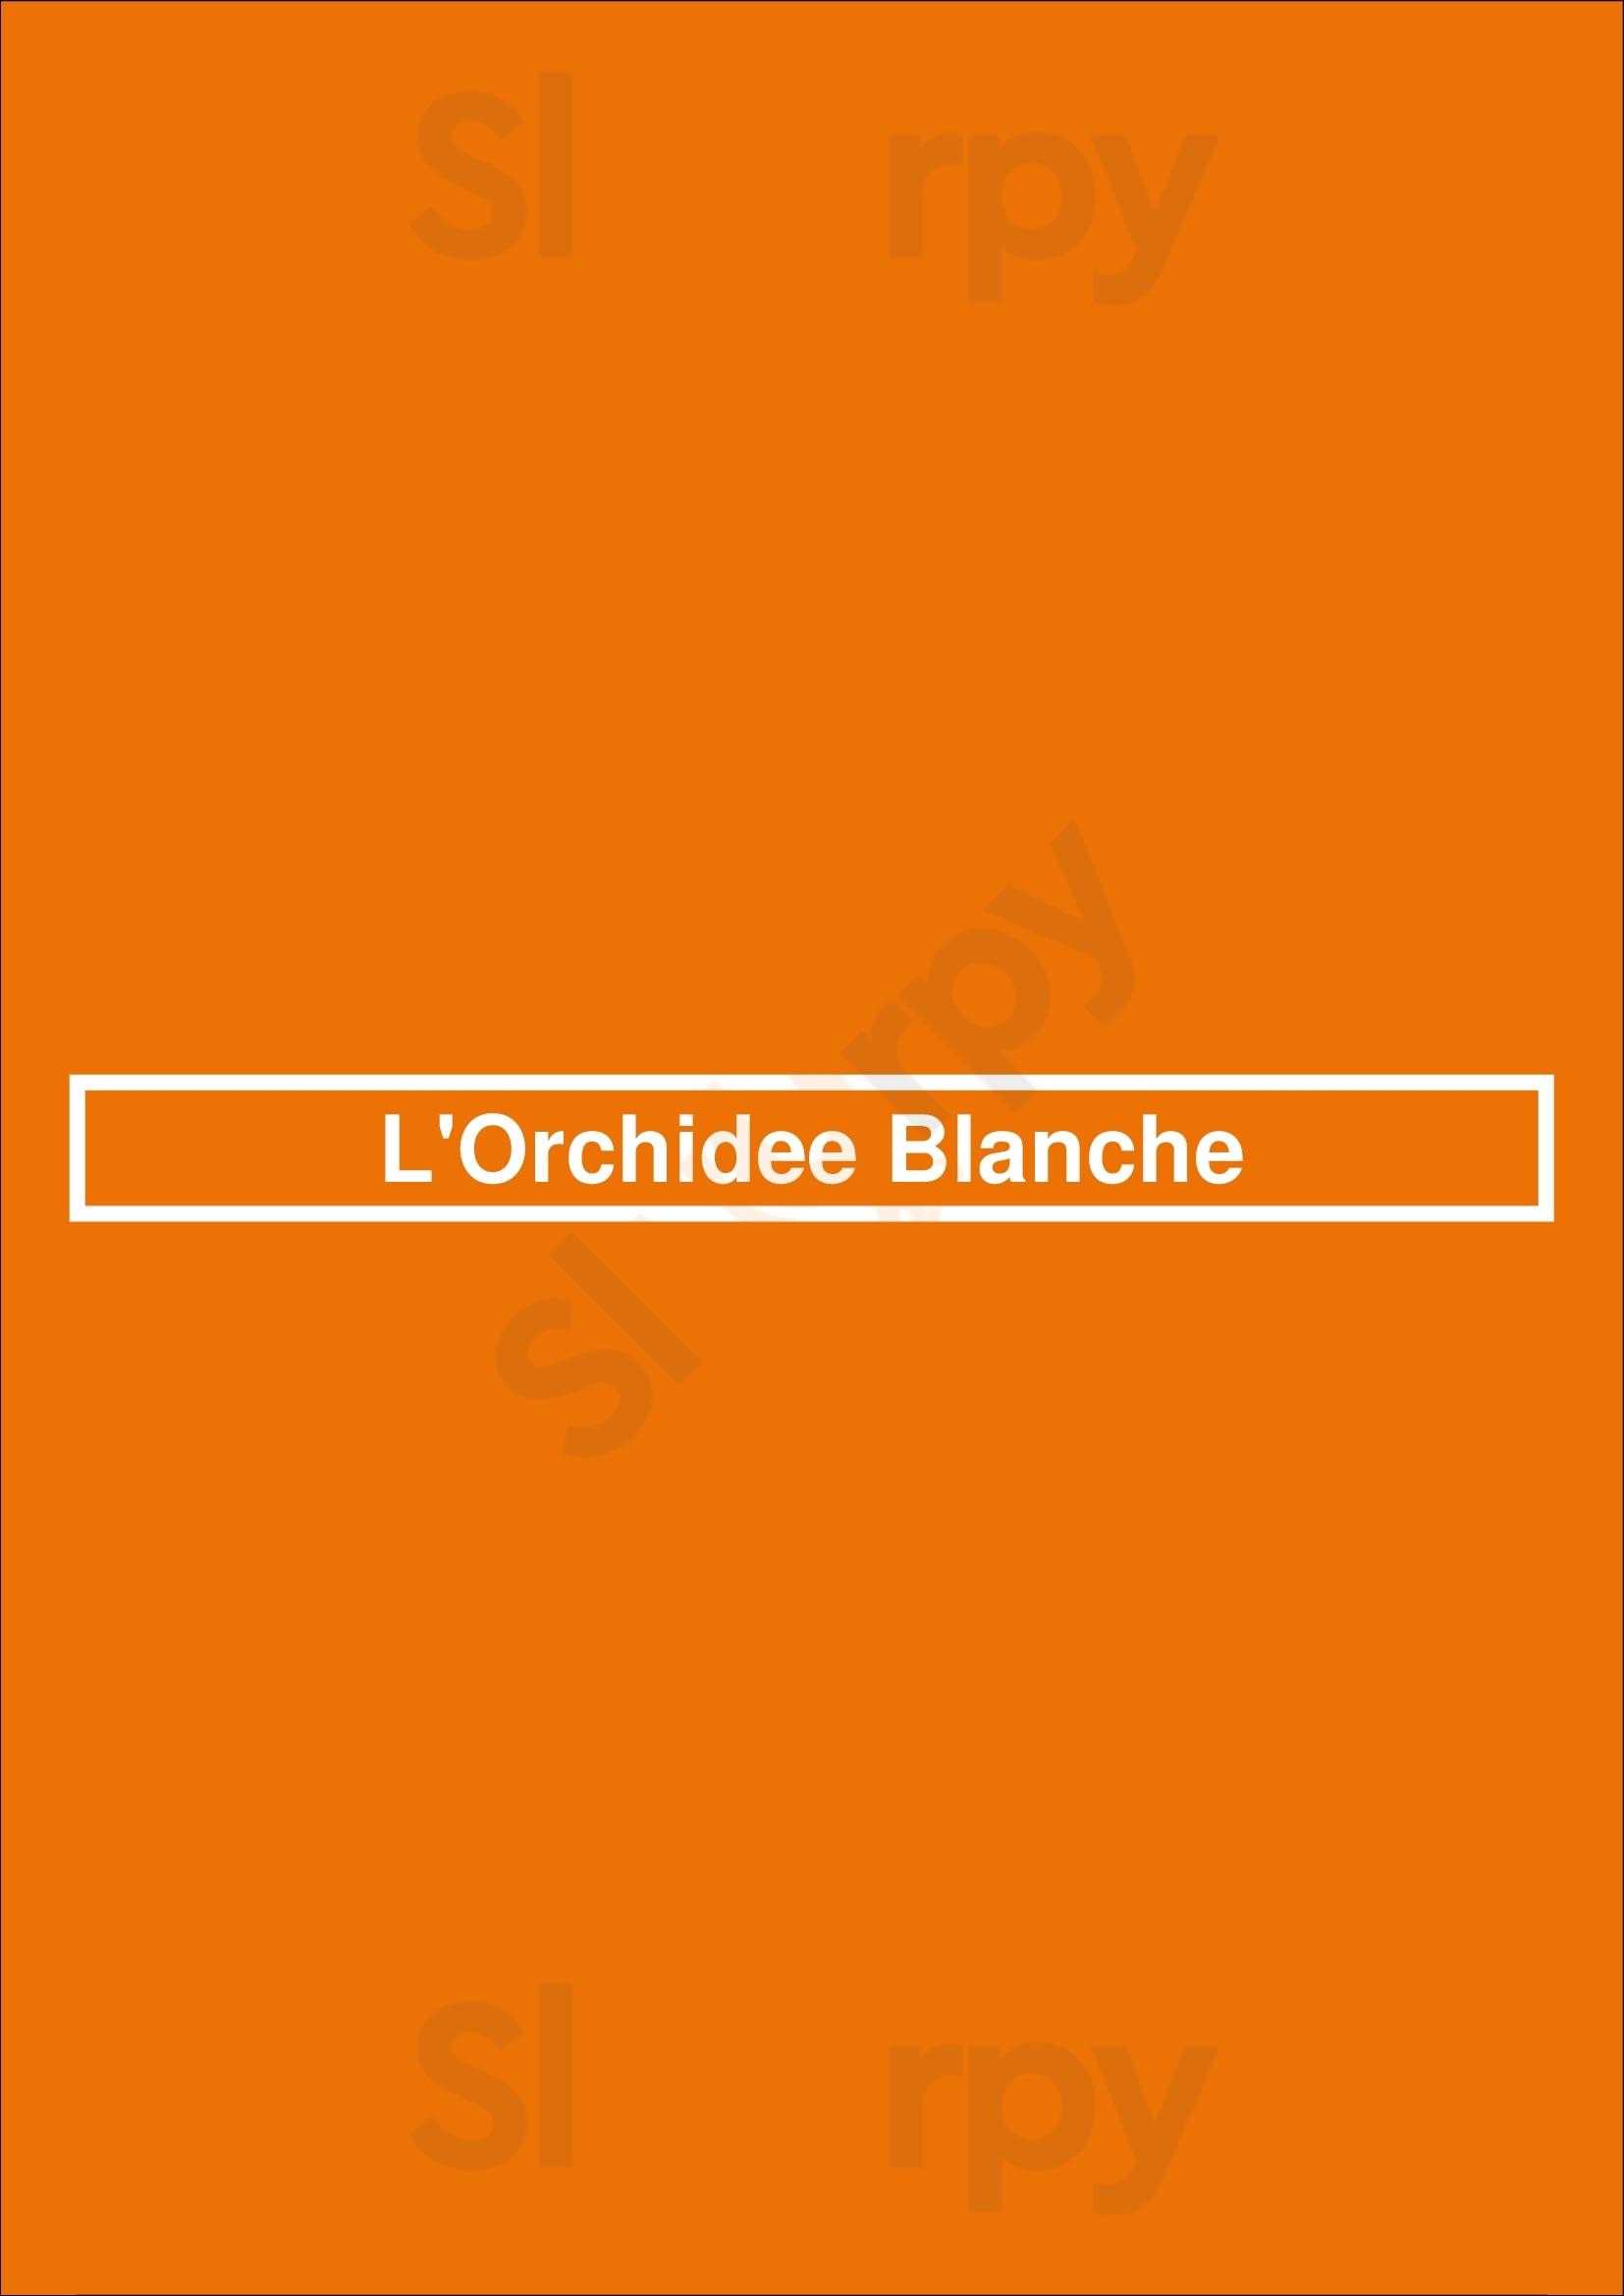 L'orchidee Blanche Bruxelles Menu - 1